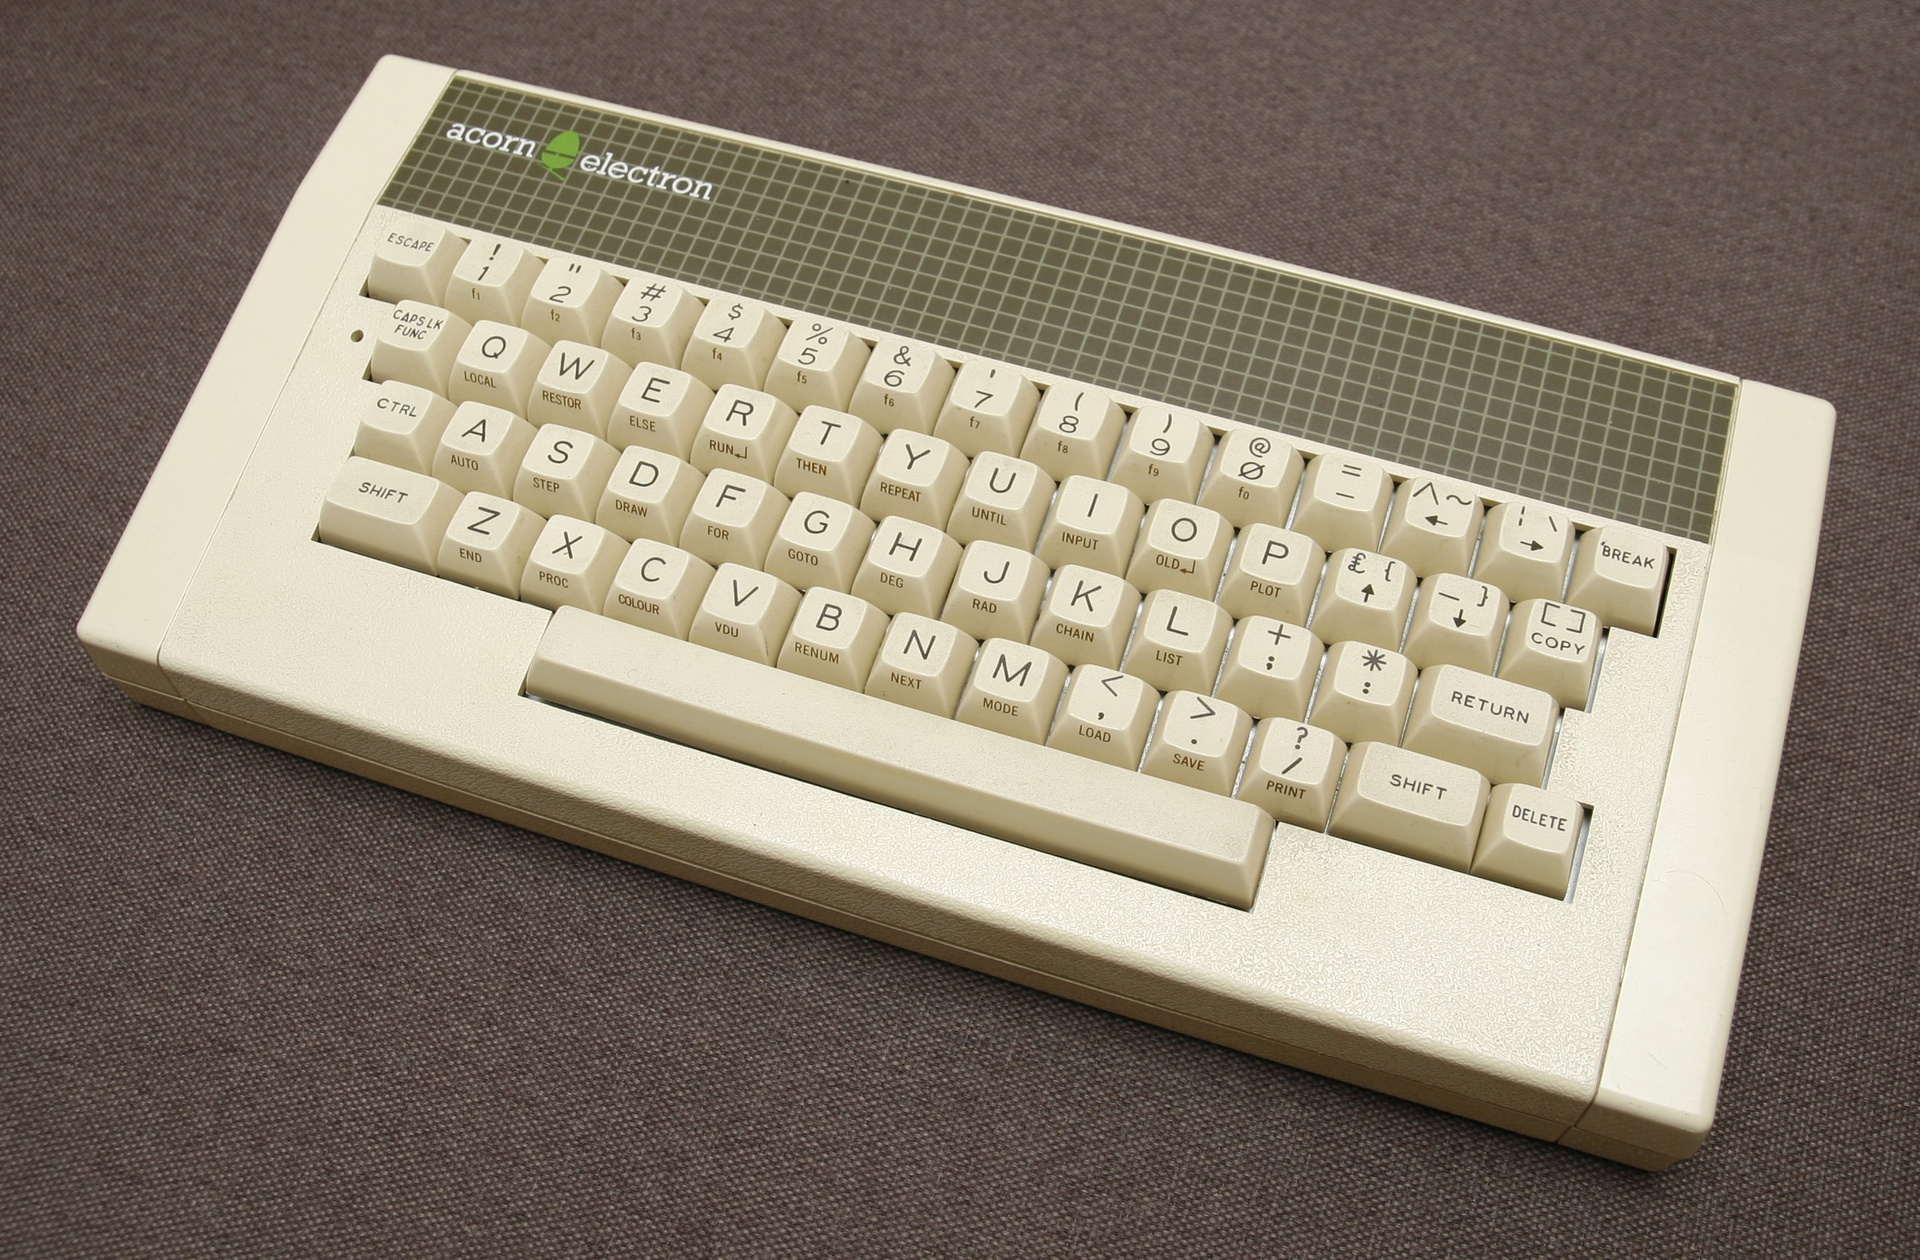 Acorn Electron — неудачный наследник BBC Micro